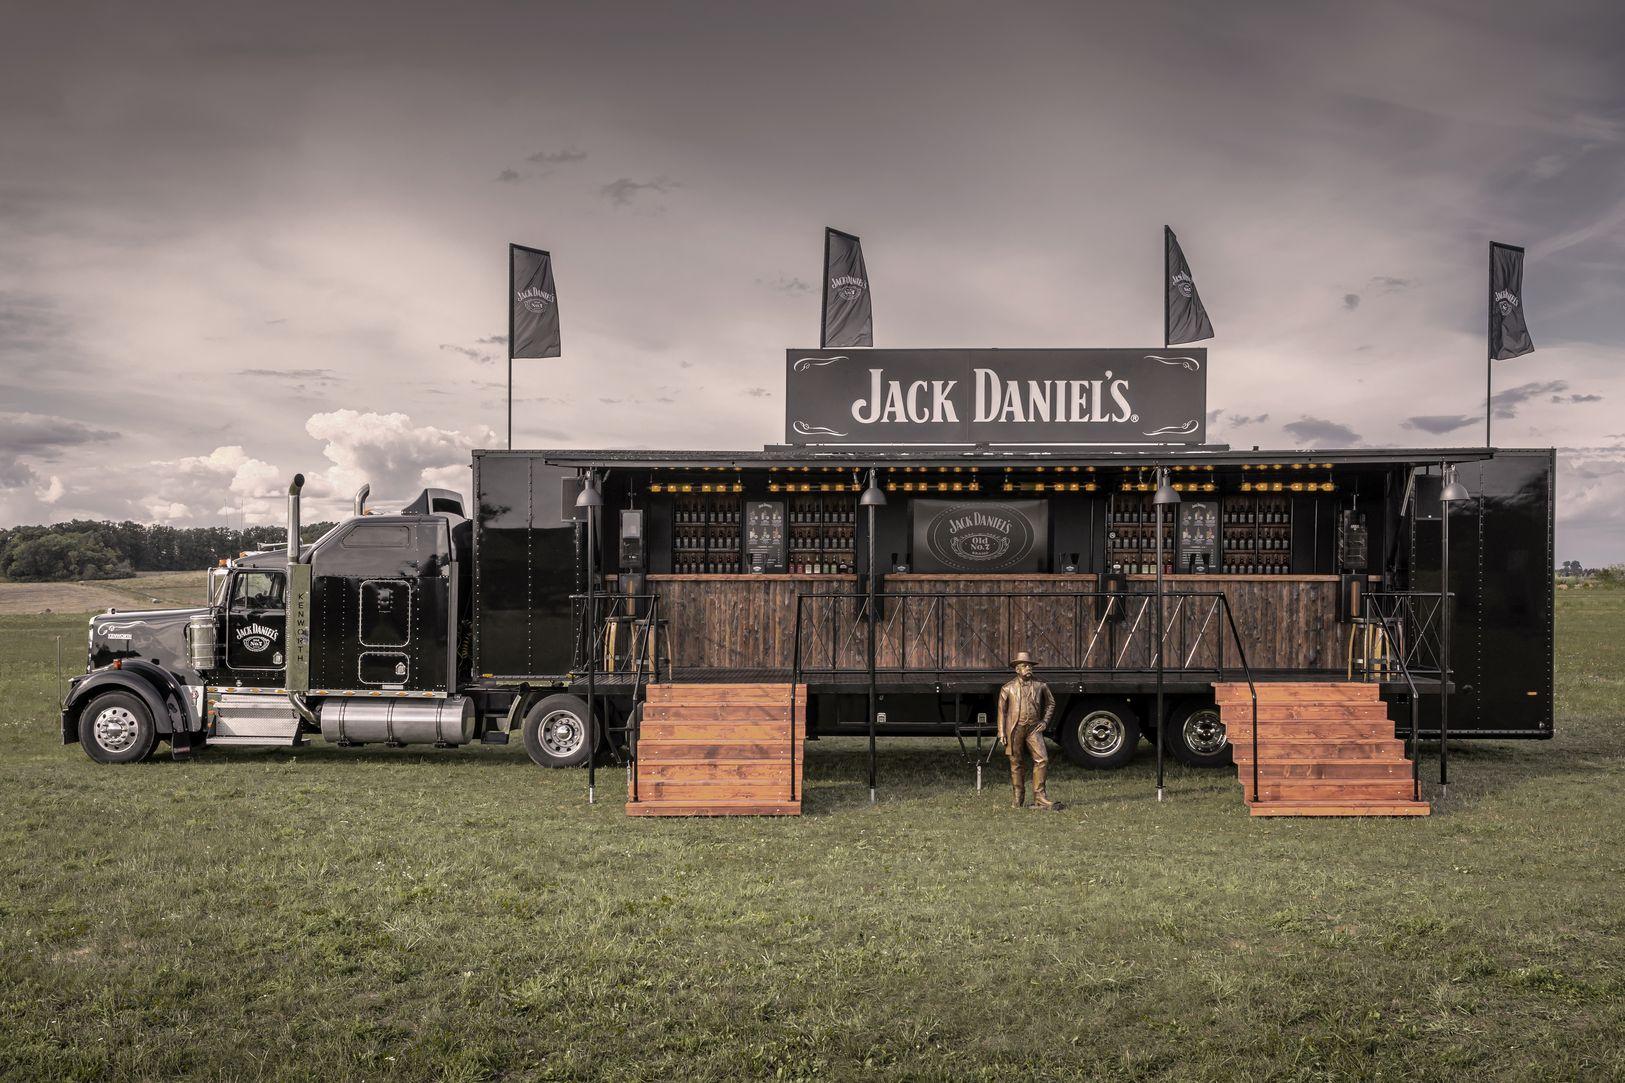 1_1625x1083_Jack_Daniels_Truck-II